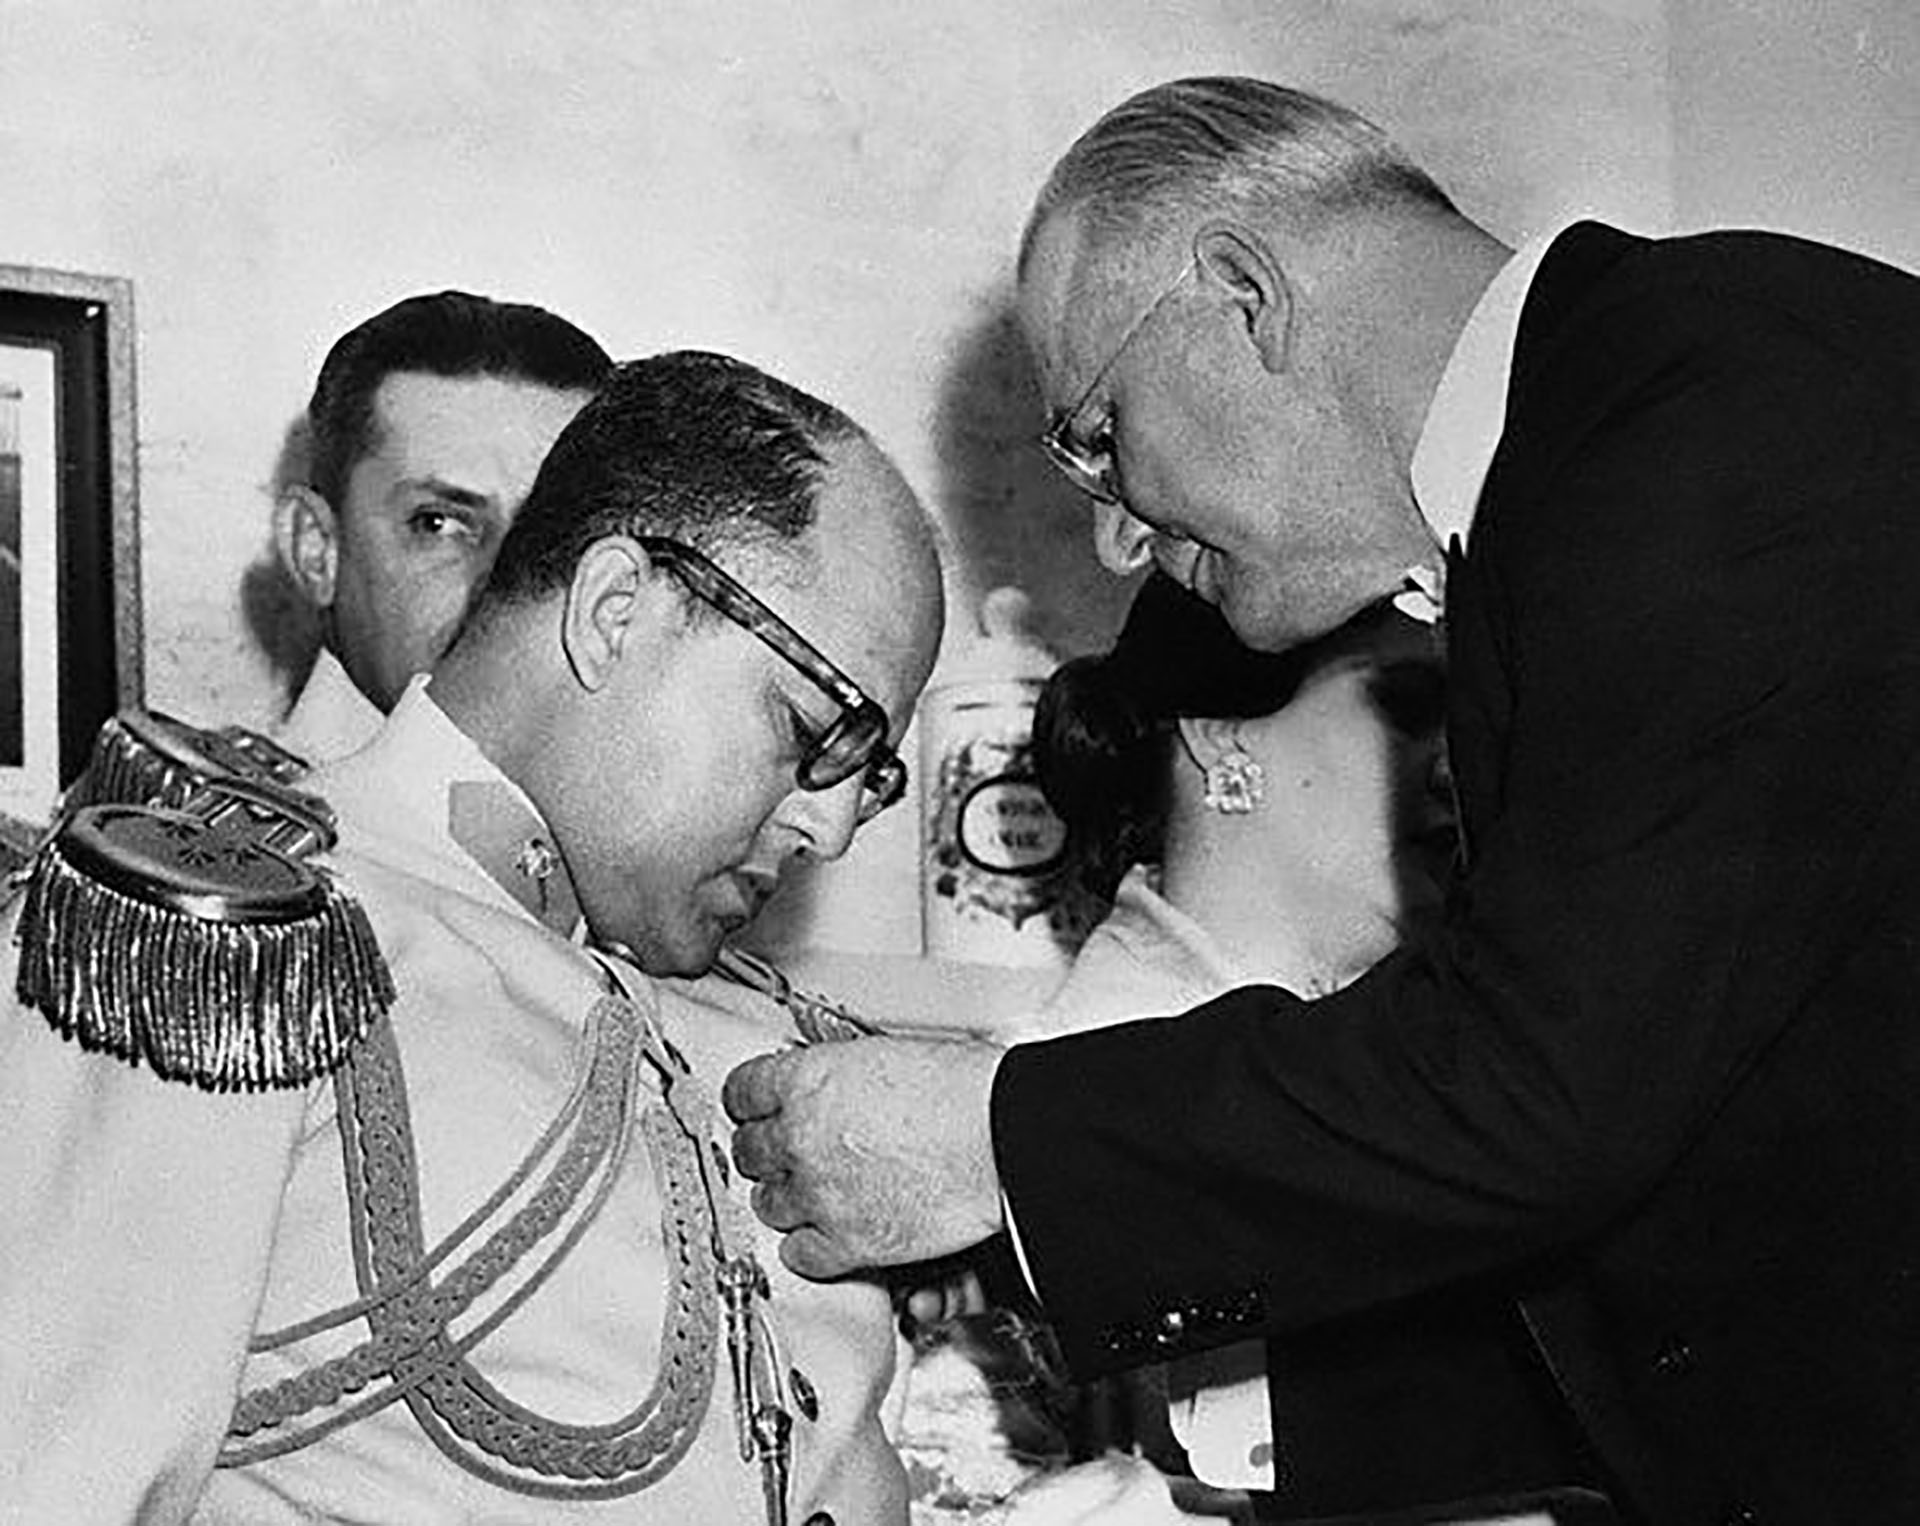 Marcos Pérez Jiménez, el último dictador venezolano en el siglo XX (Bettmann/CORBIS)